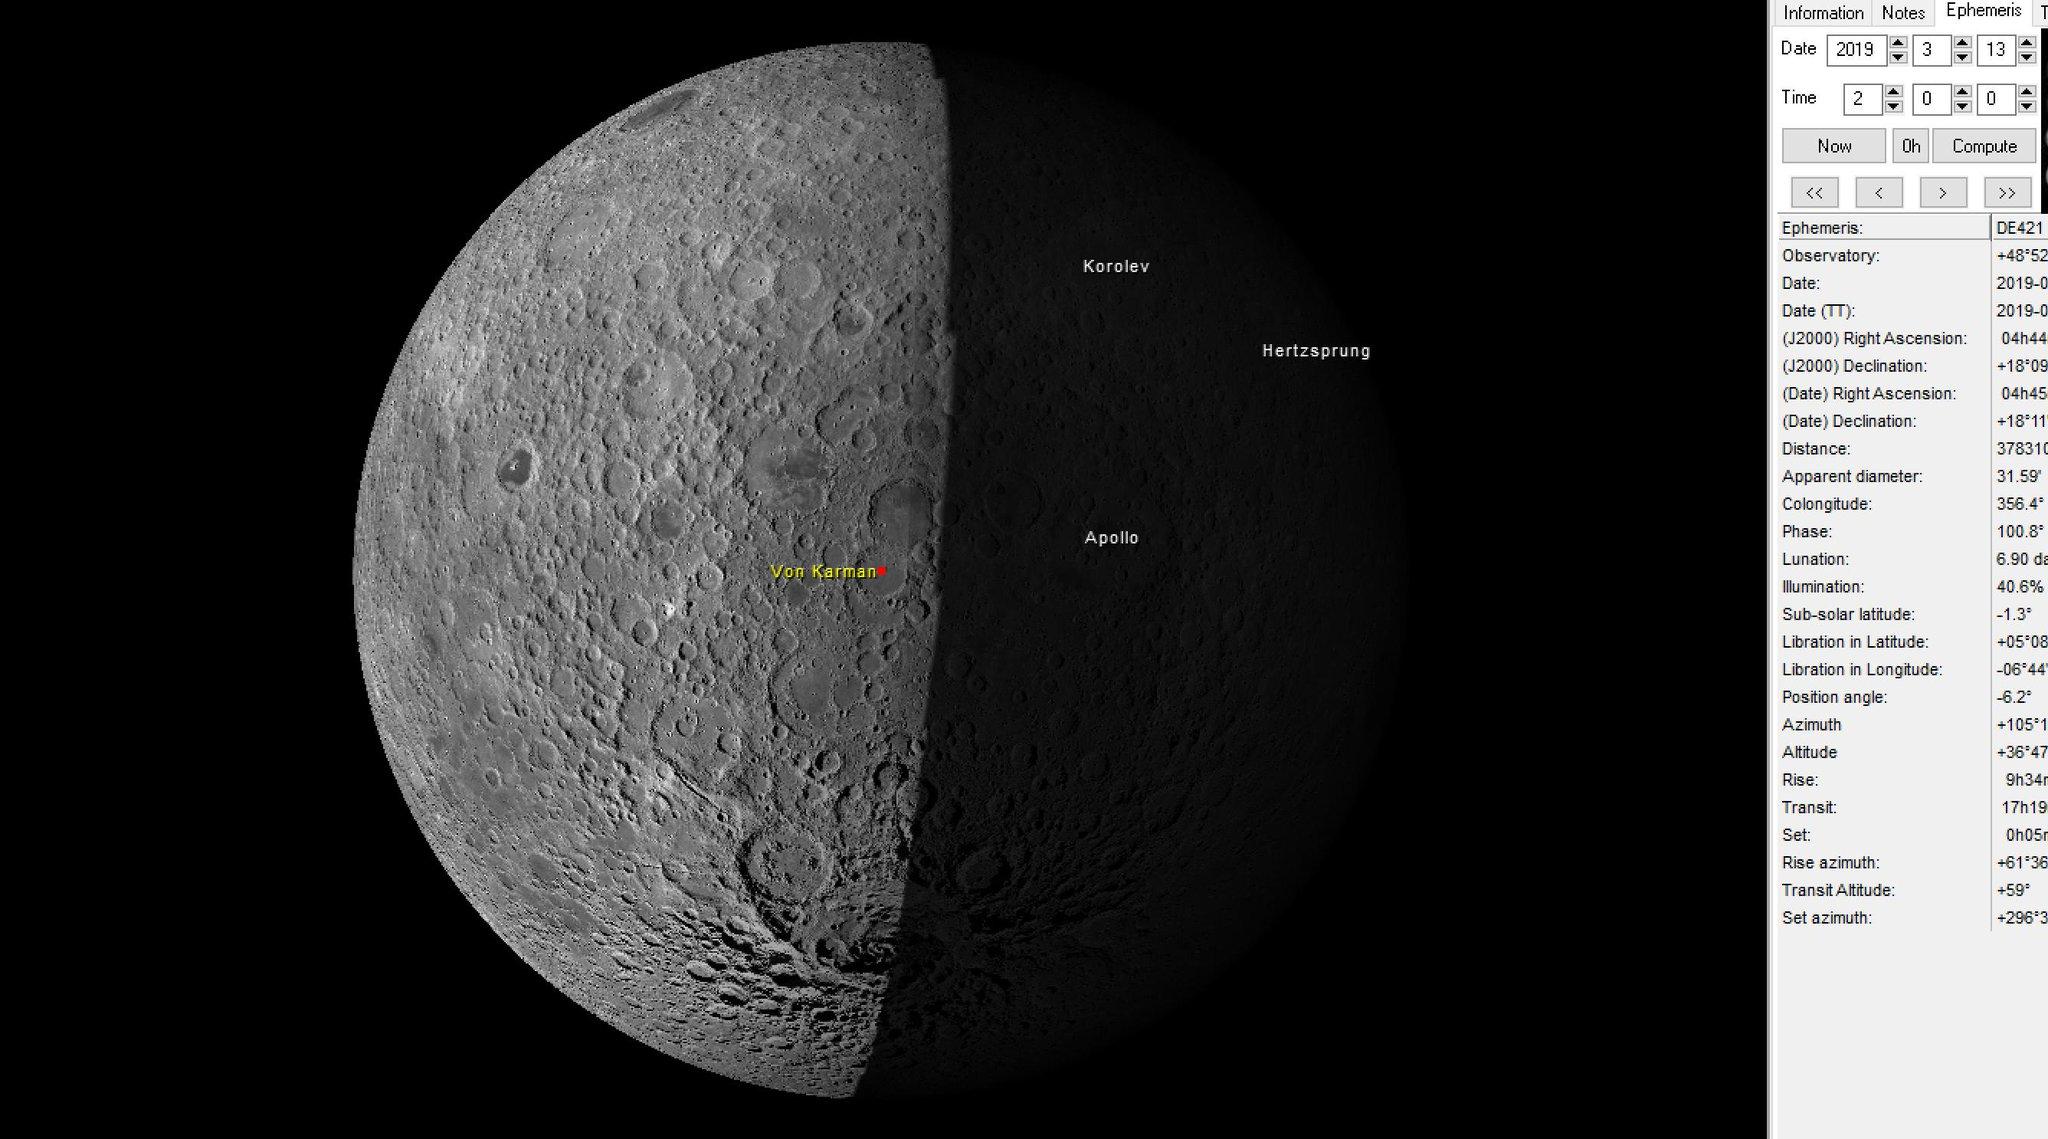 Миссия «Чанъэ-4» — третий лунный день. Ровер «Юйту-2» в поисках… камней - 3